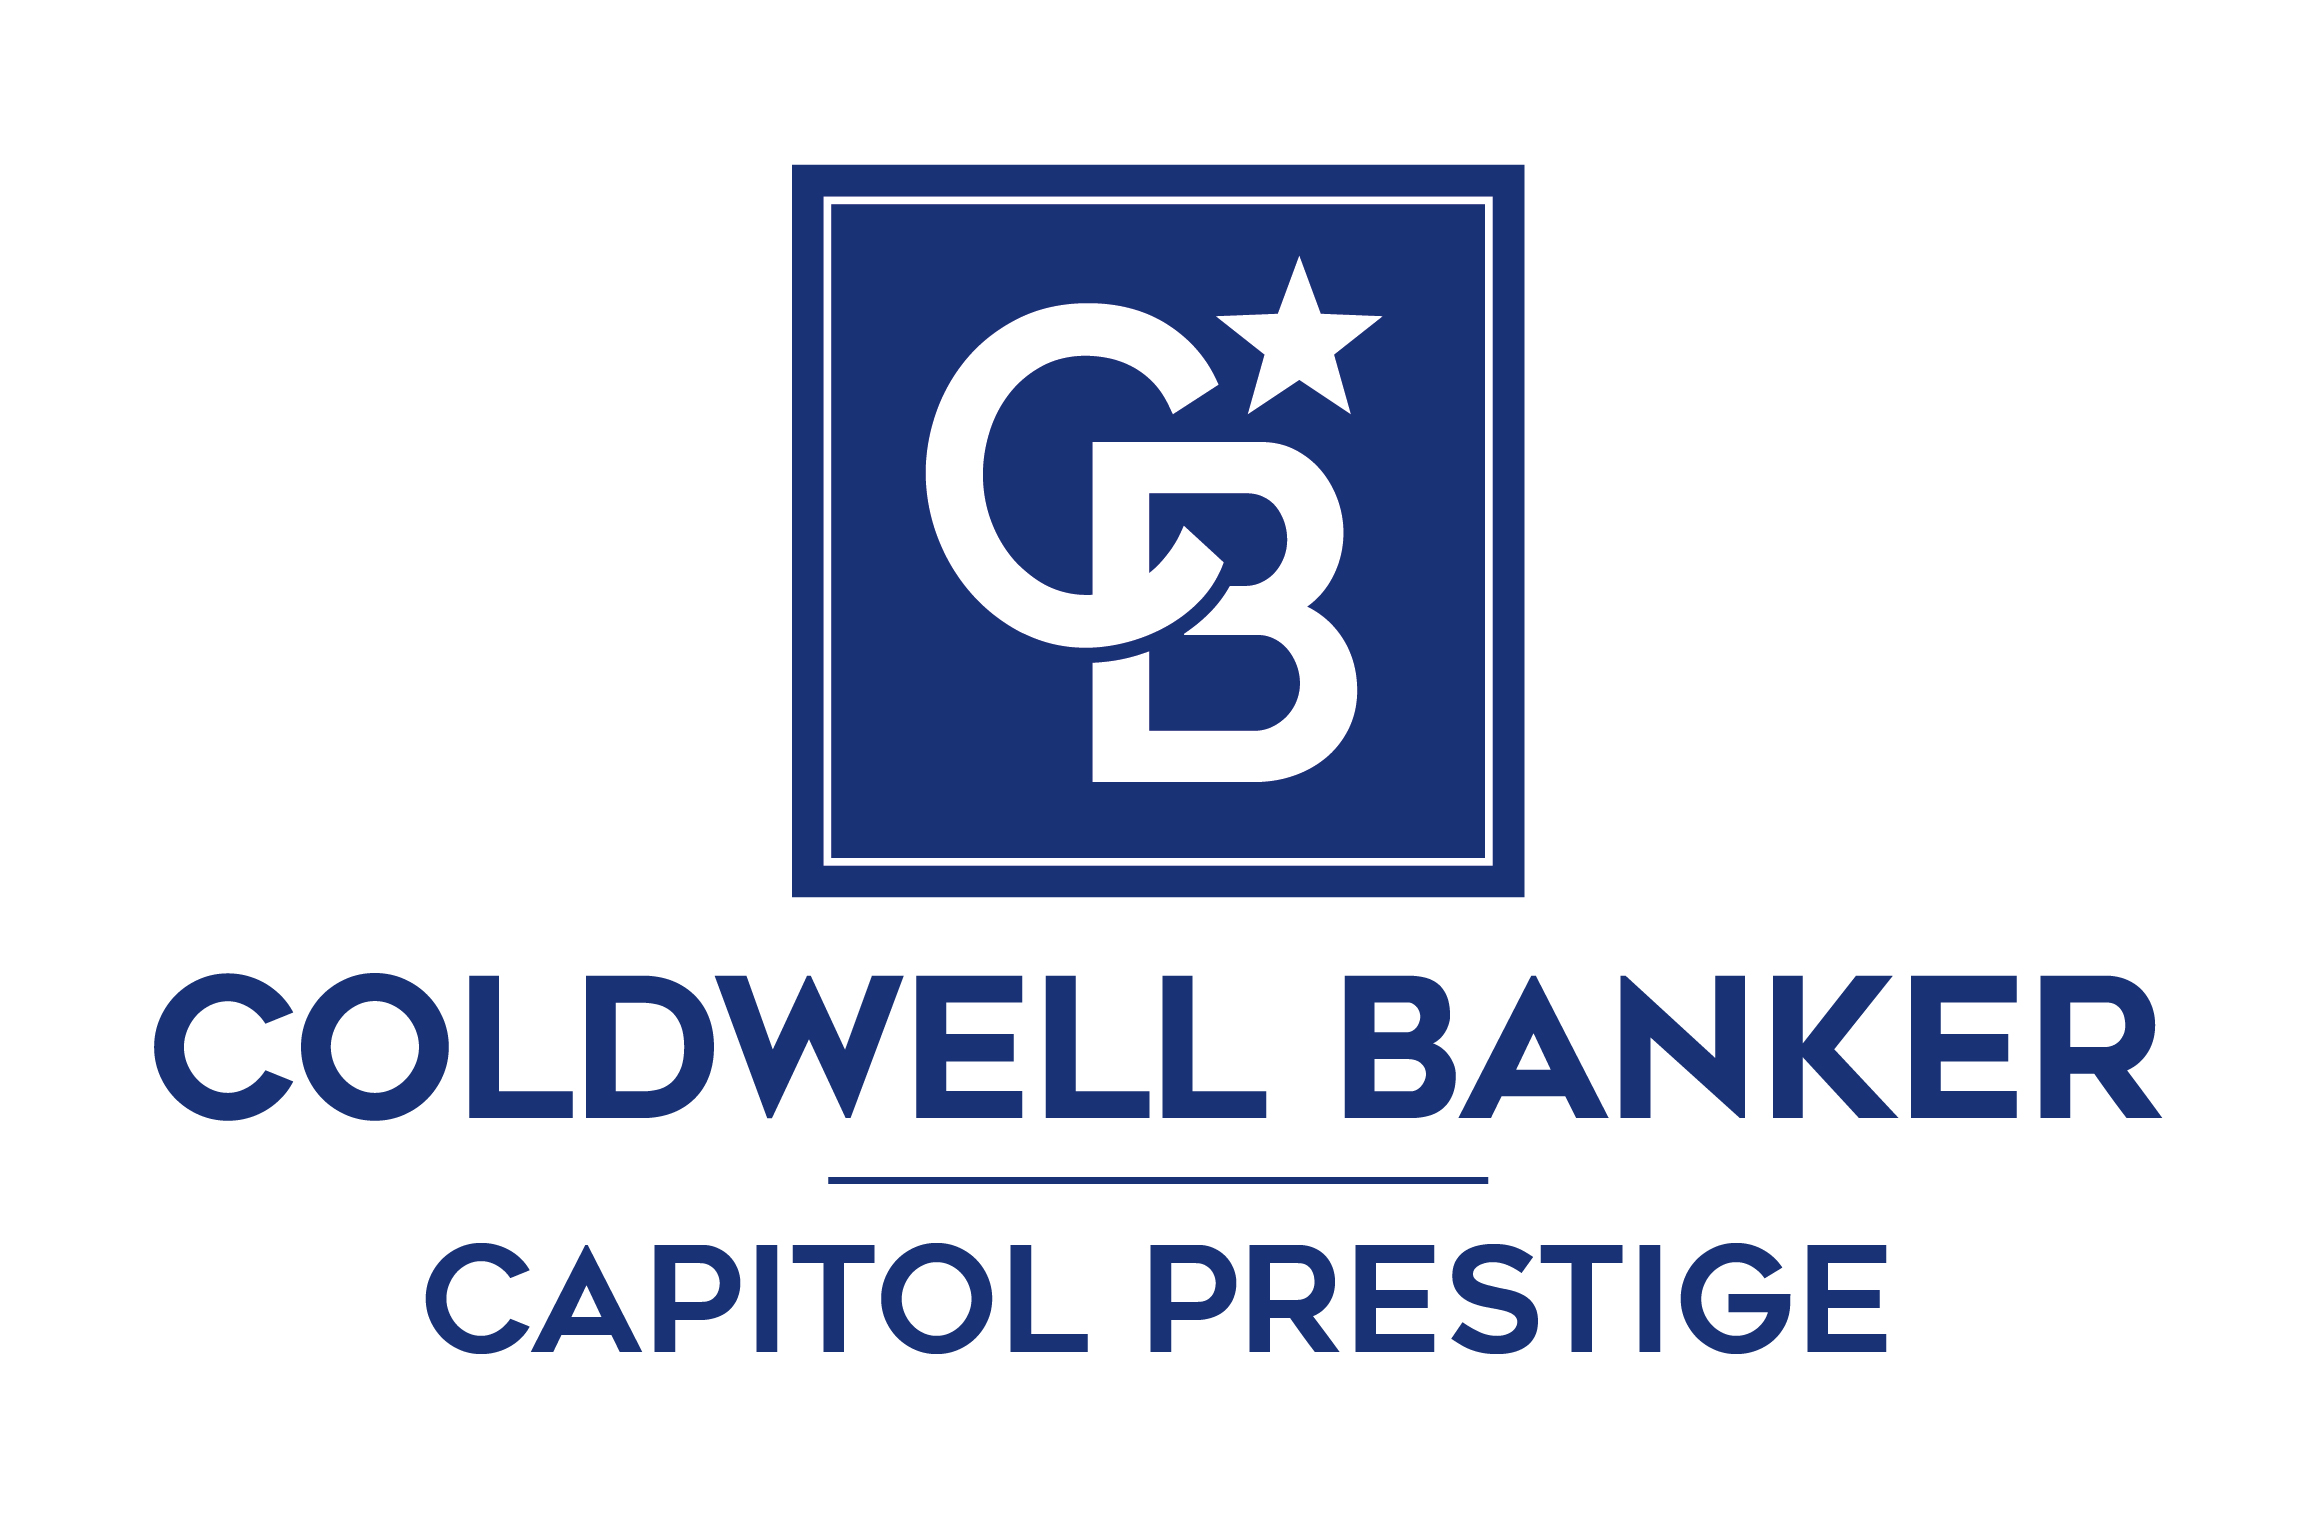 LogoCOLDWELL BANKER TOULOUSE